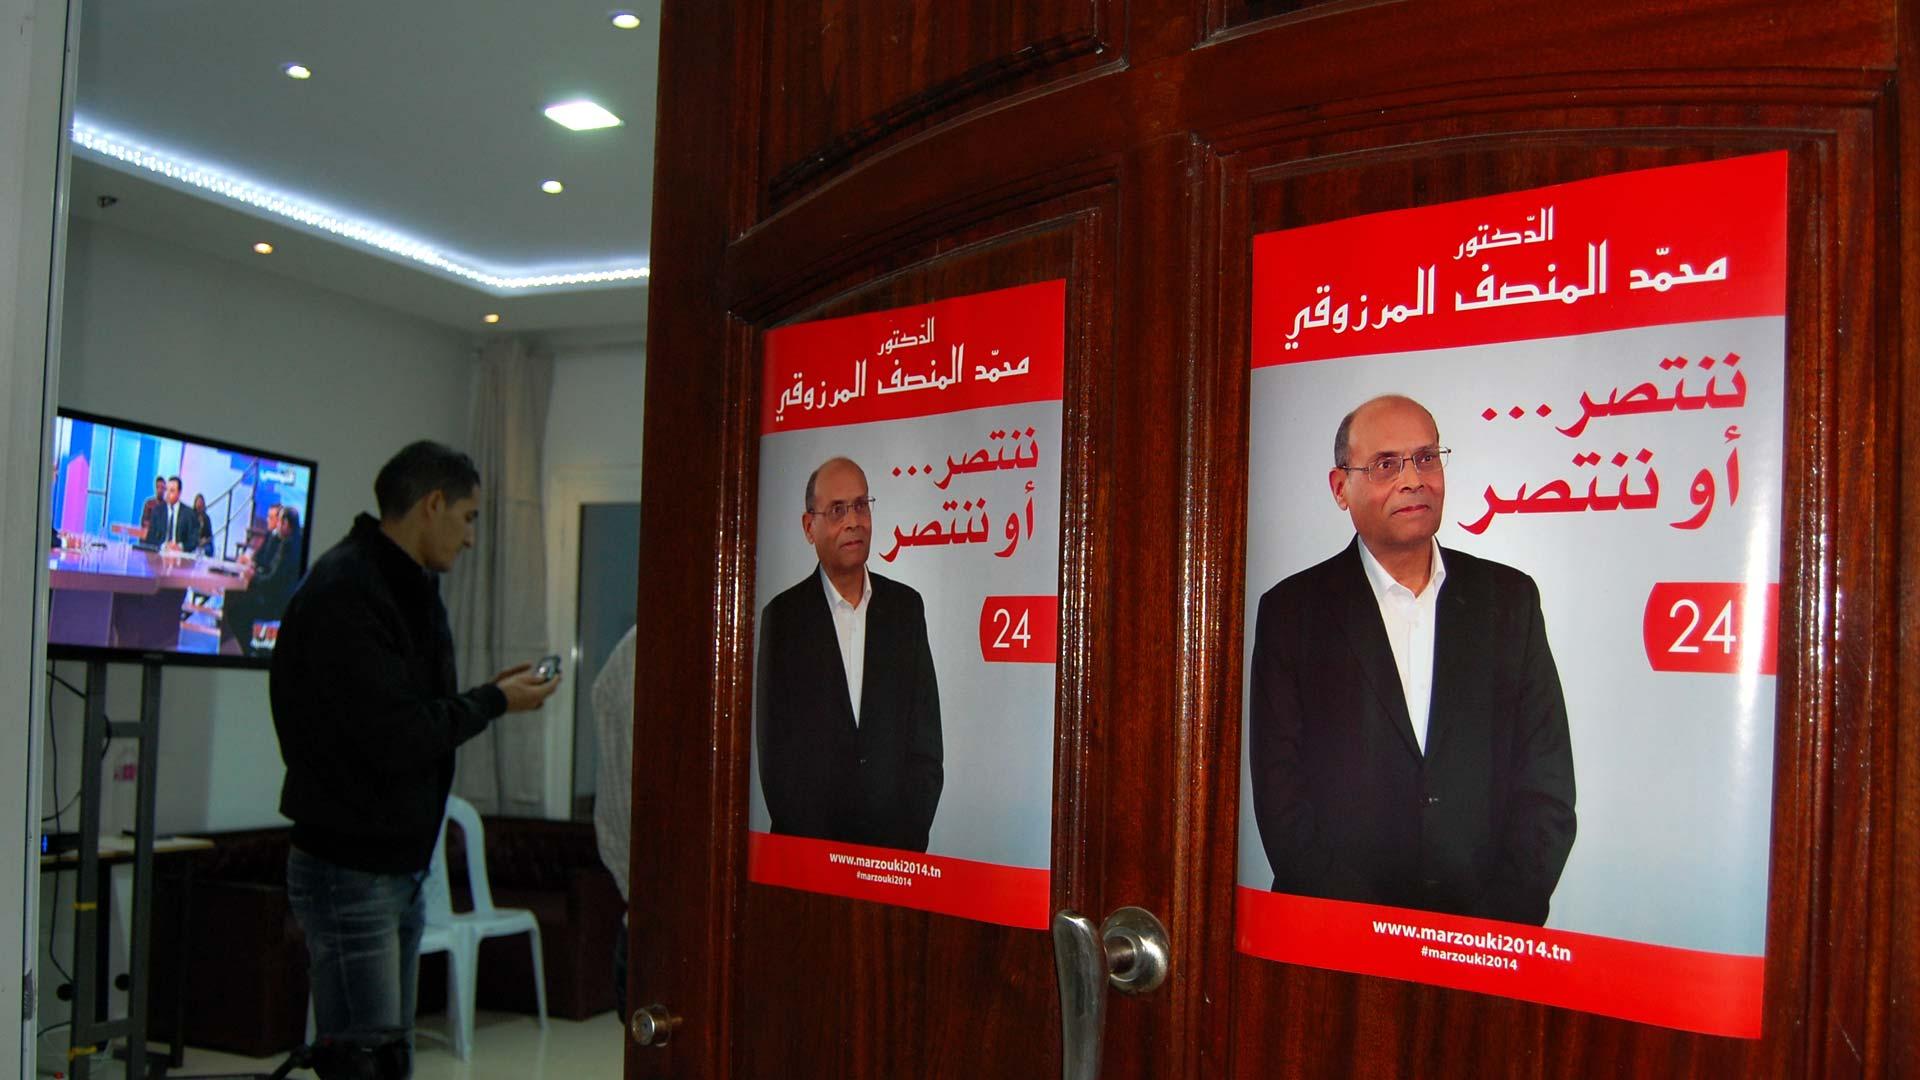 24-tnelec2014-presidentielle-qg-campagne-marzouki-1920-inkyfada